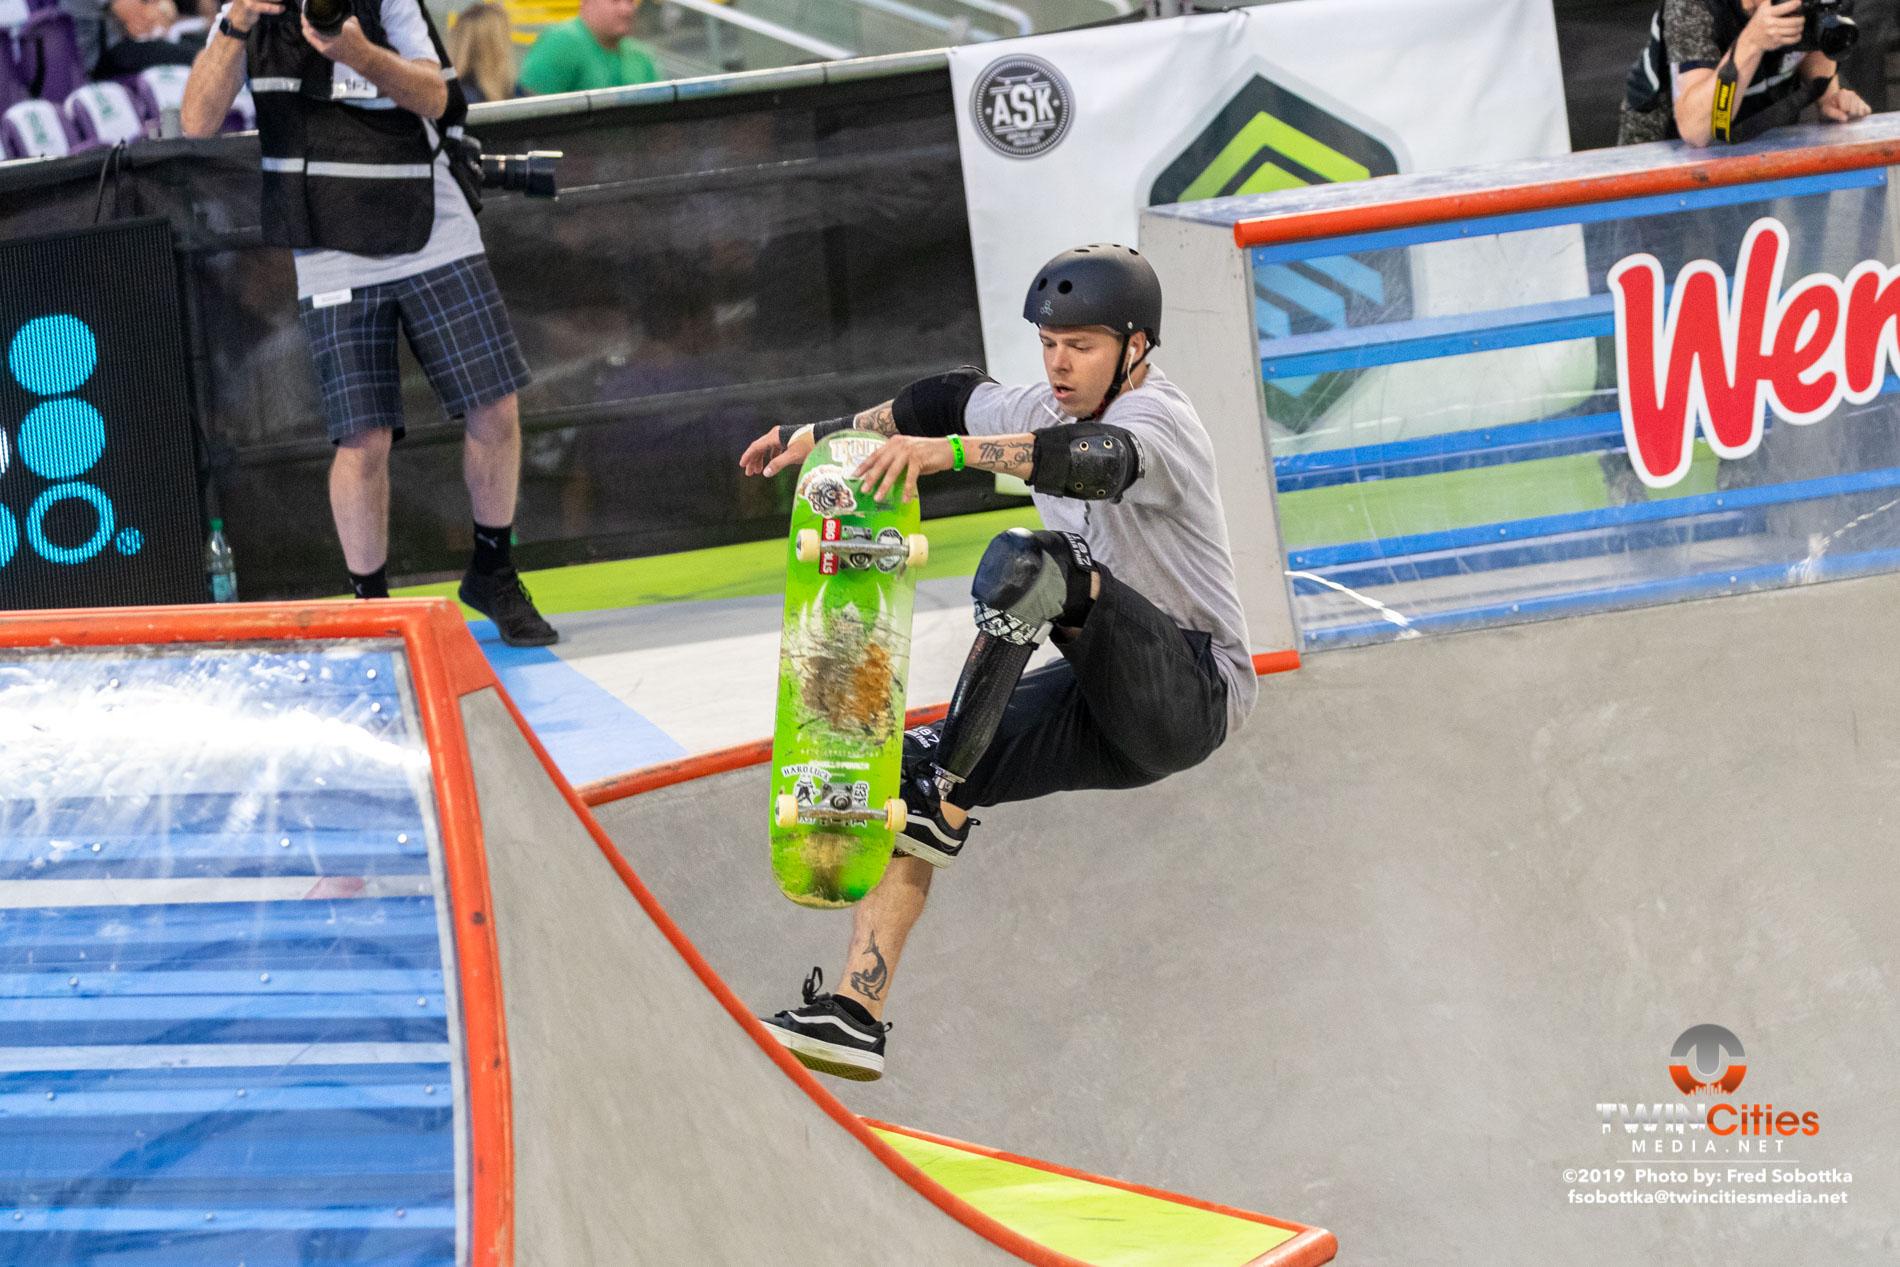 Adaptive-Skateboard-Park-14